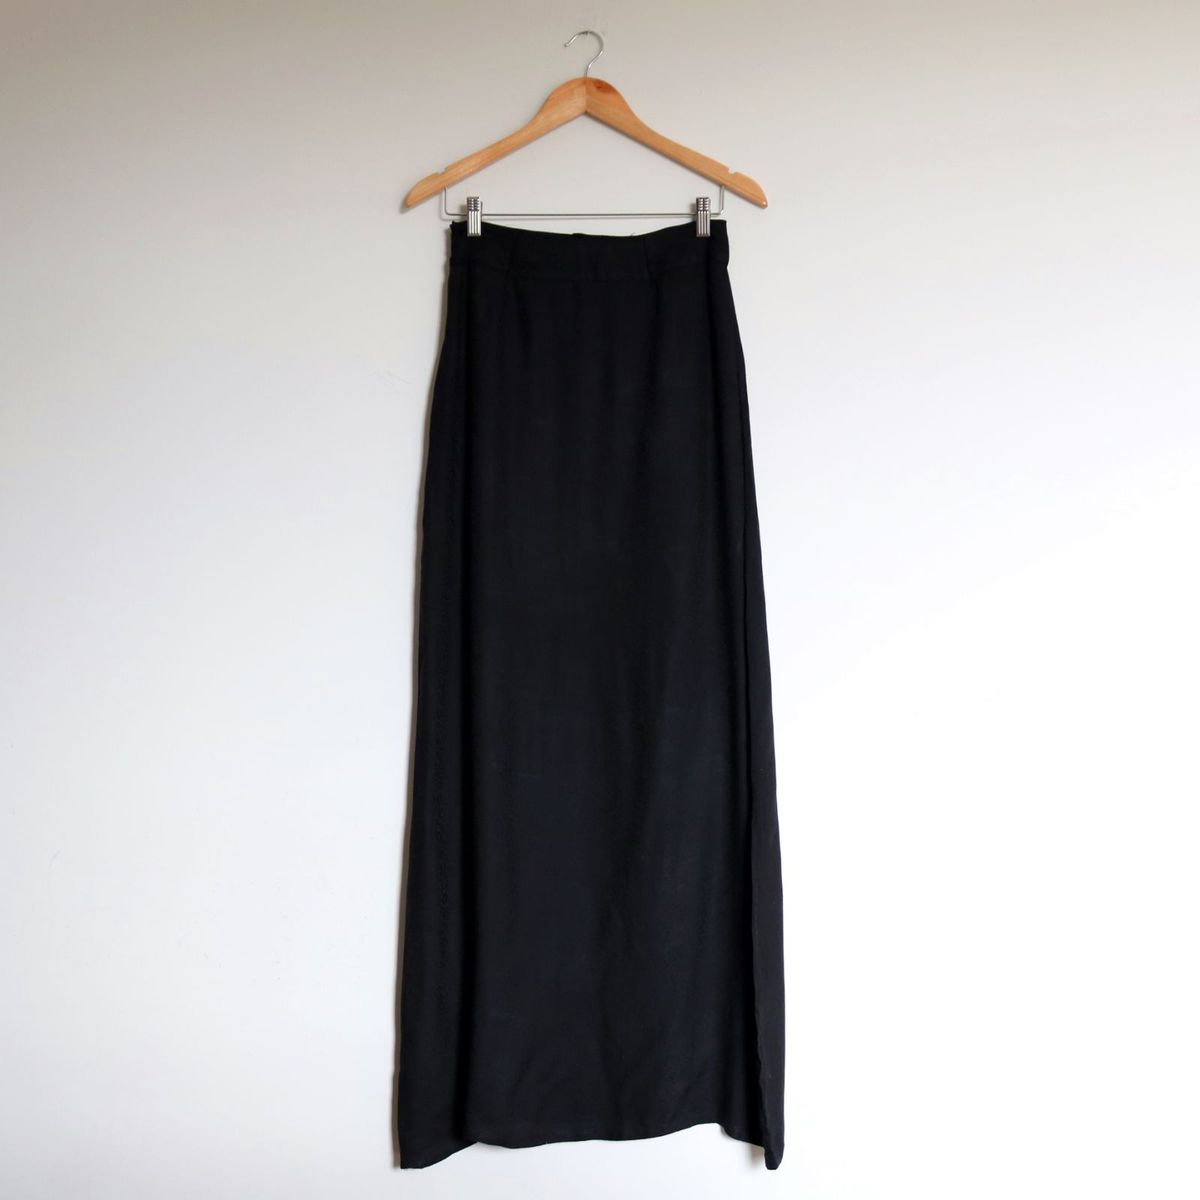 saia longa preta - saias sem marca